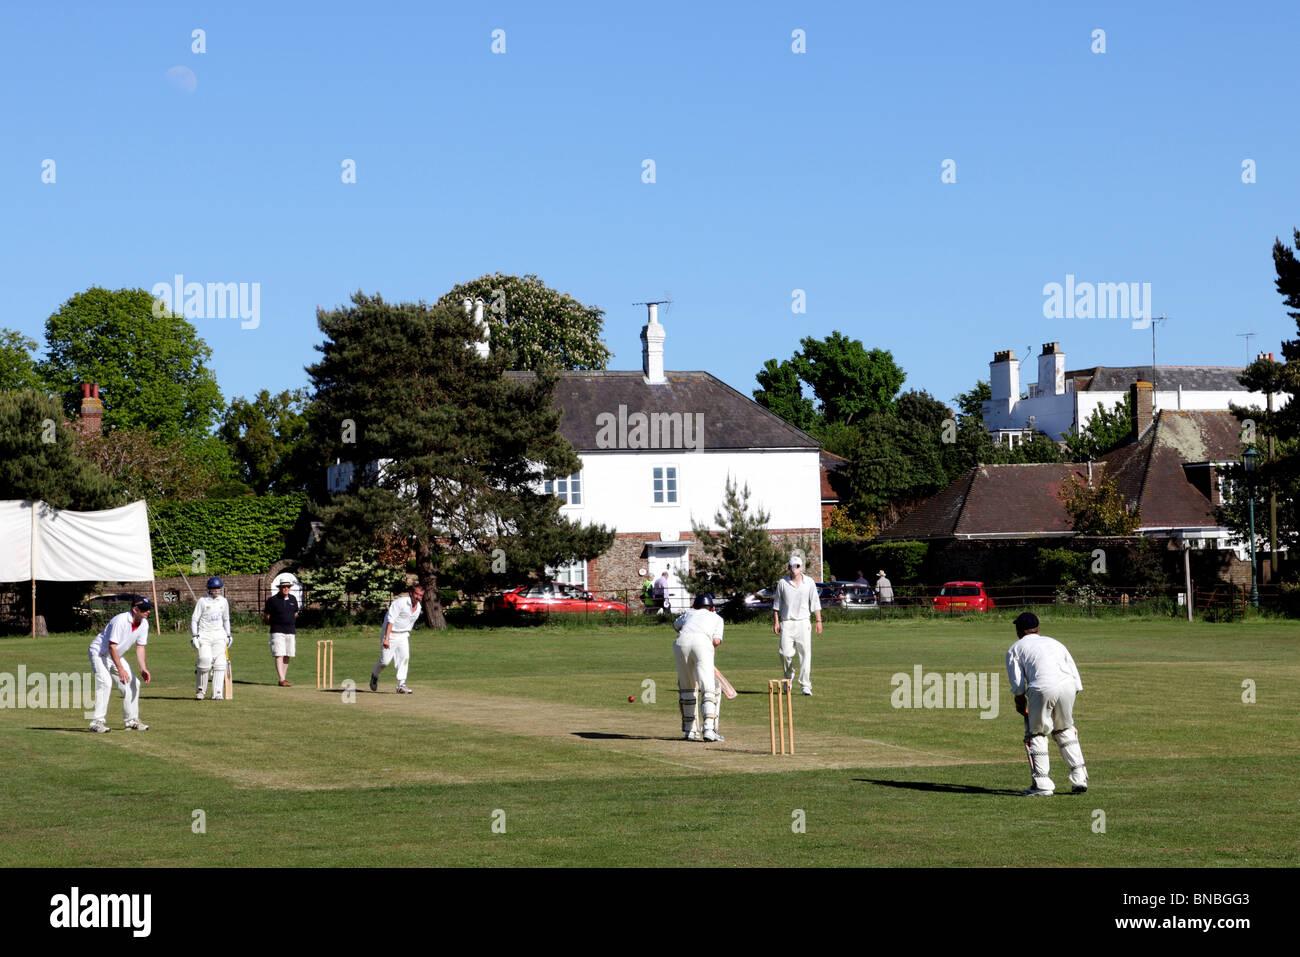 3208. Village Cricket, Winchelsea, East Sussex, UK Photo Stock